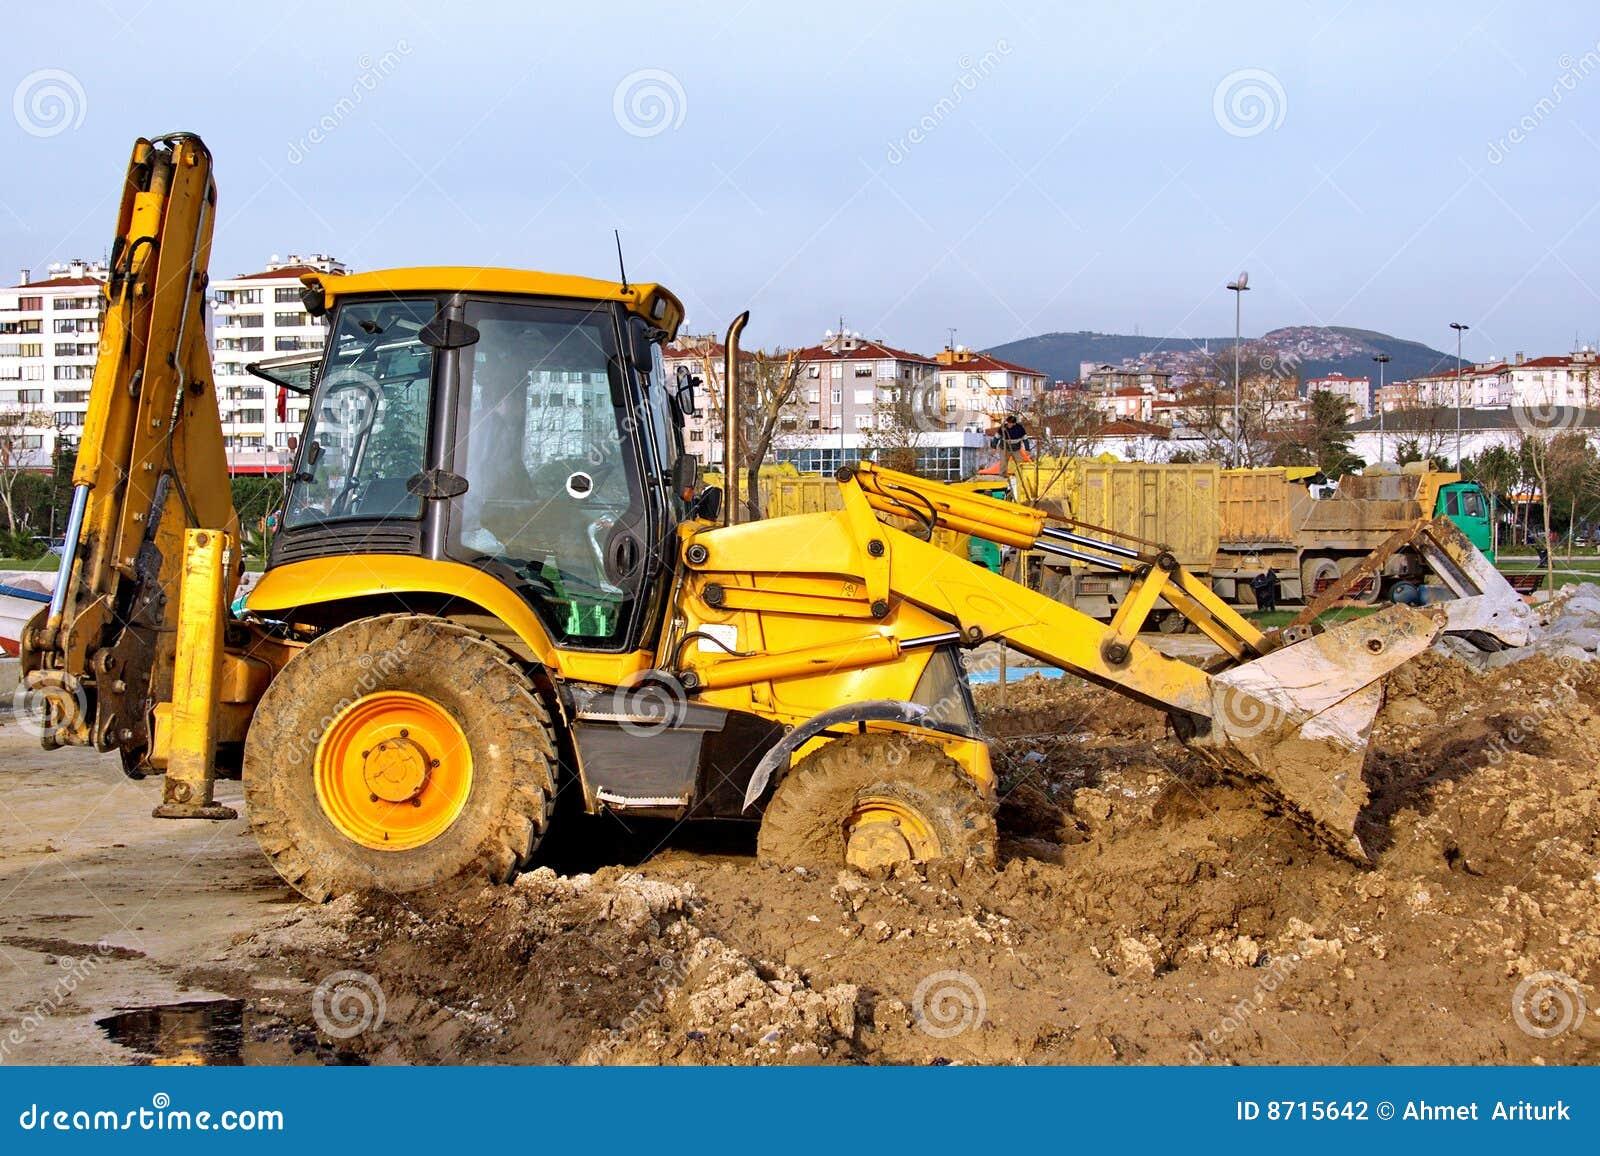 Best Heavy Equipment To Build Dirt Road